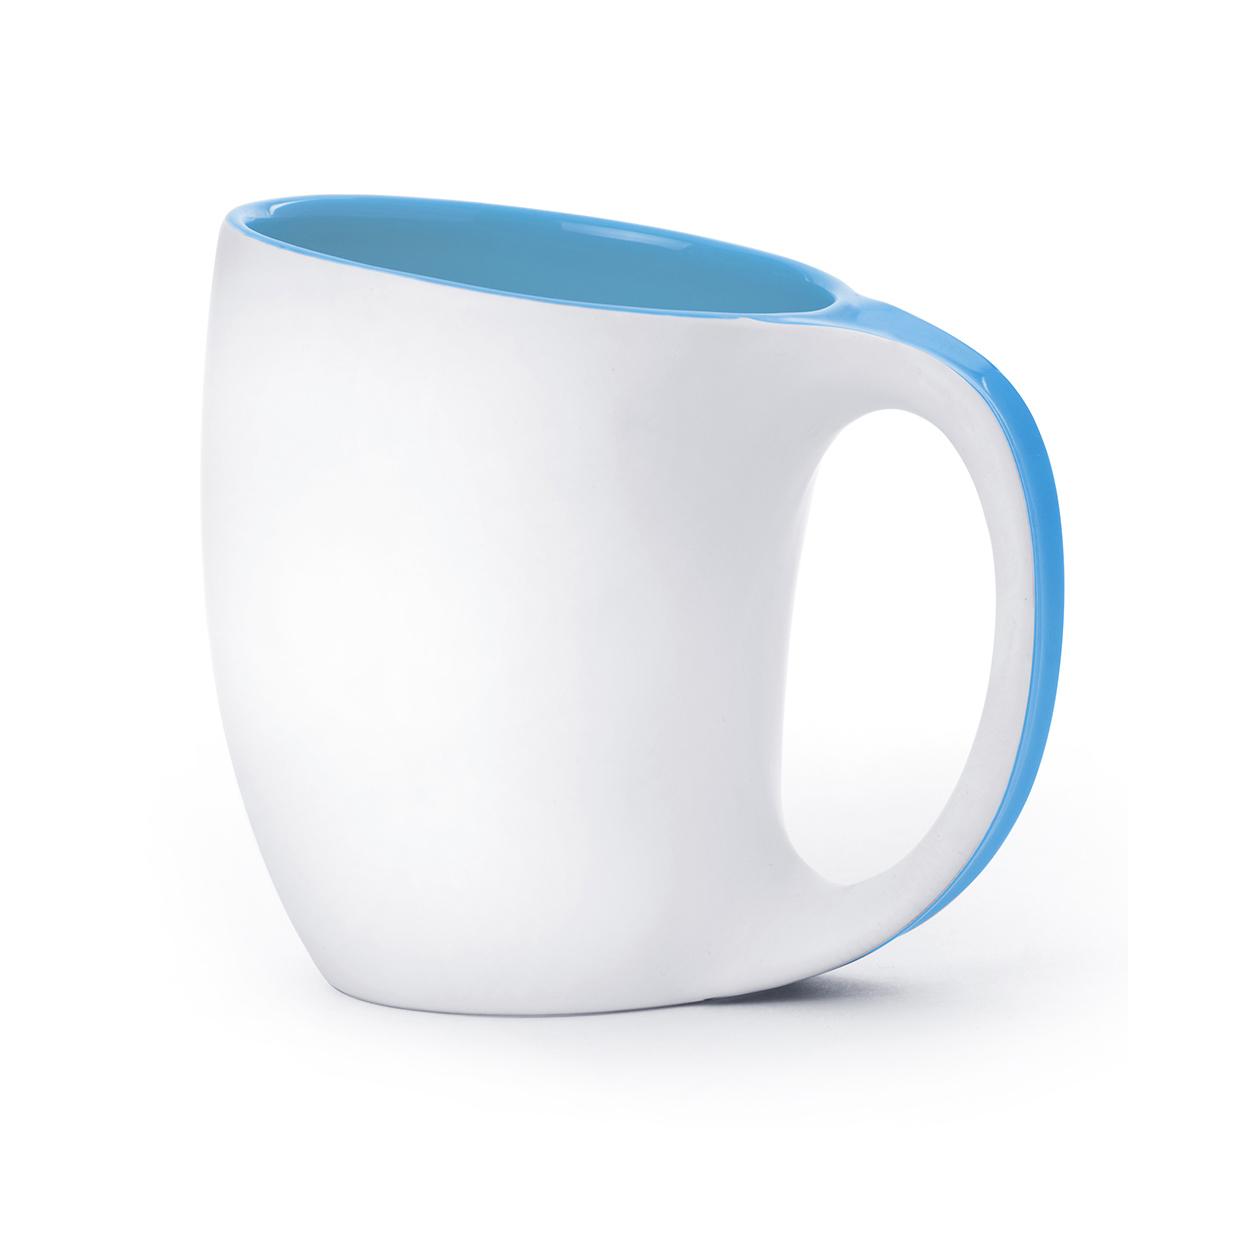 Кружка Asobu The porcelain saphire (0,4 литра) голубая